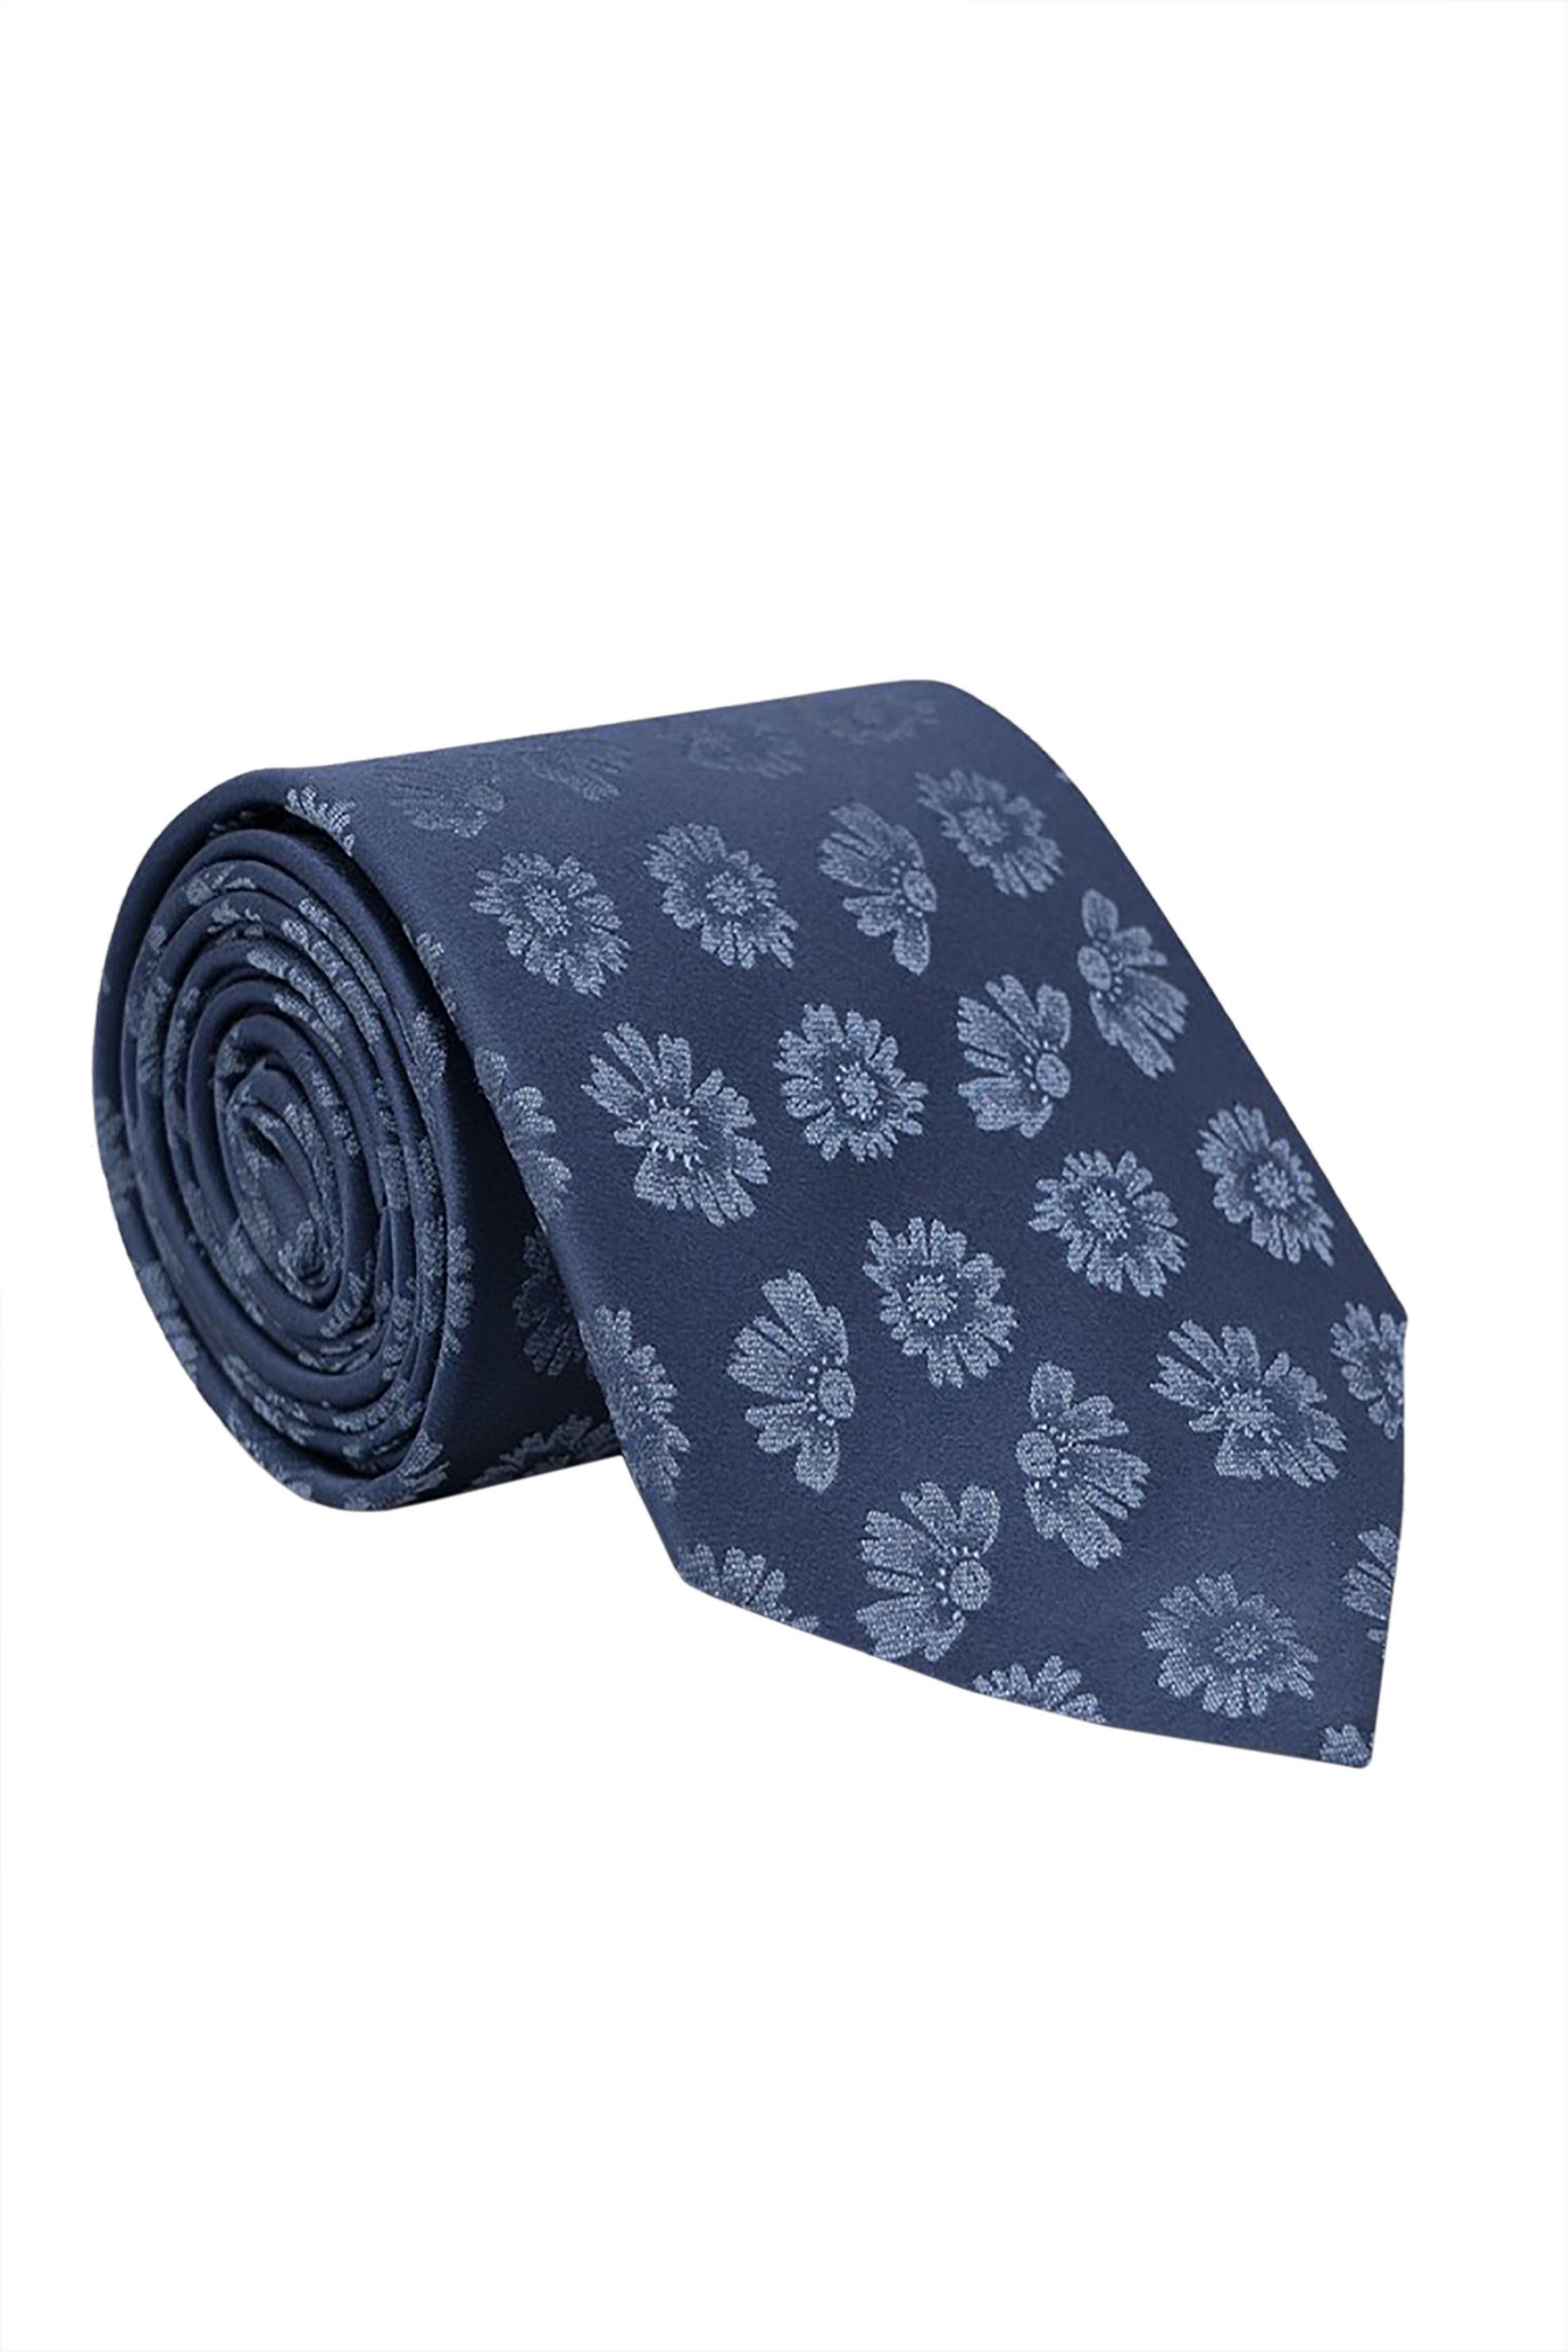 Oxford Company ανδρική μεταξωτή γραβάτα με floral print - TIE51-413.01 - Μπλε Σκούρο